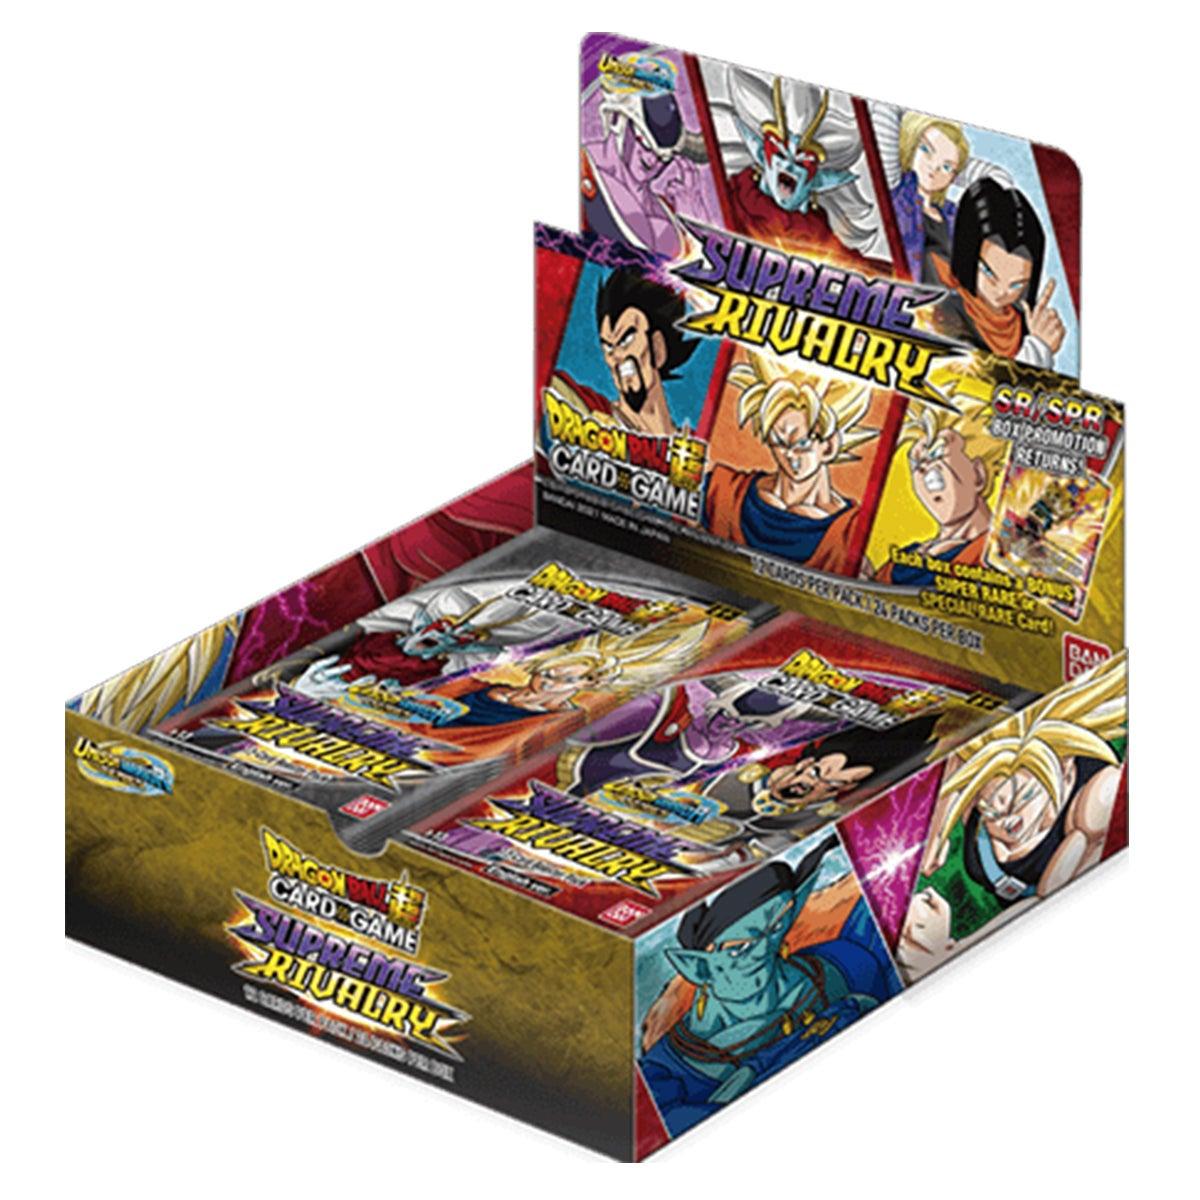 Dragon Ball Super Card Game Unison Warrior S13 UW4 Supreme Rivalry Booster Box W/ 24 Packs